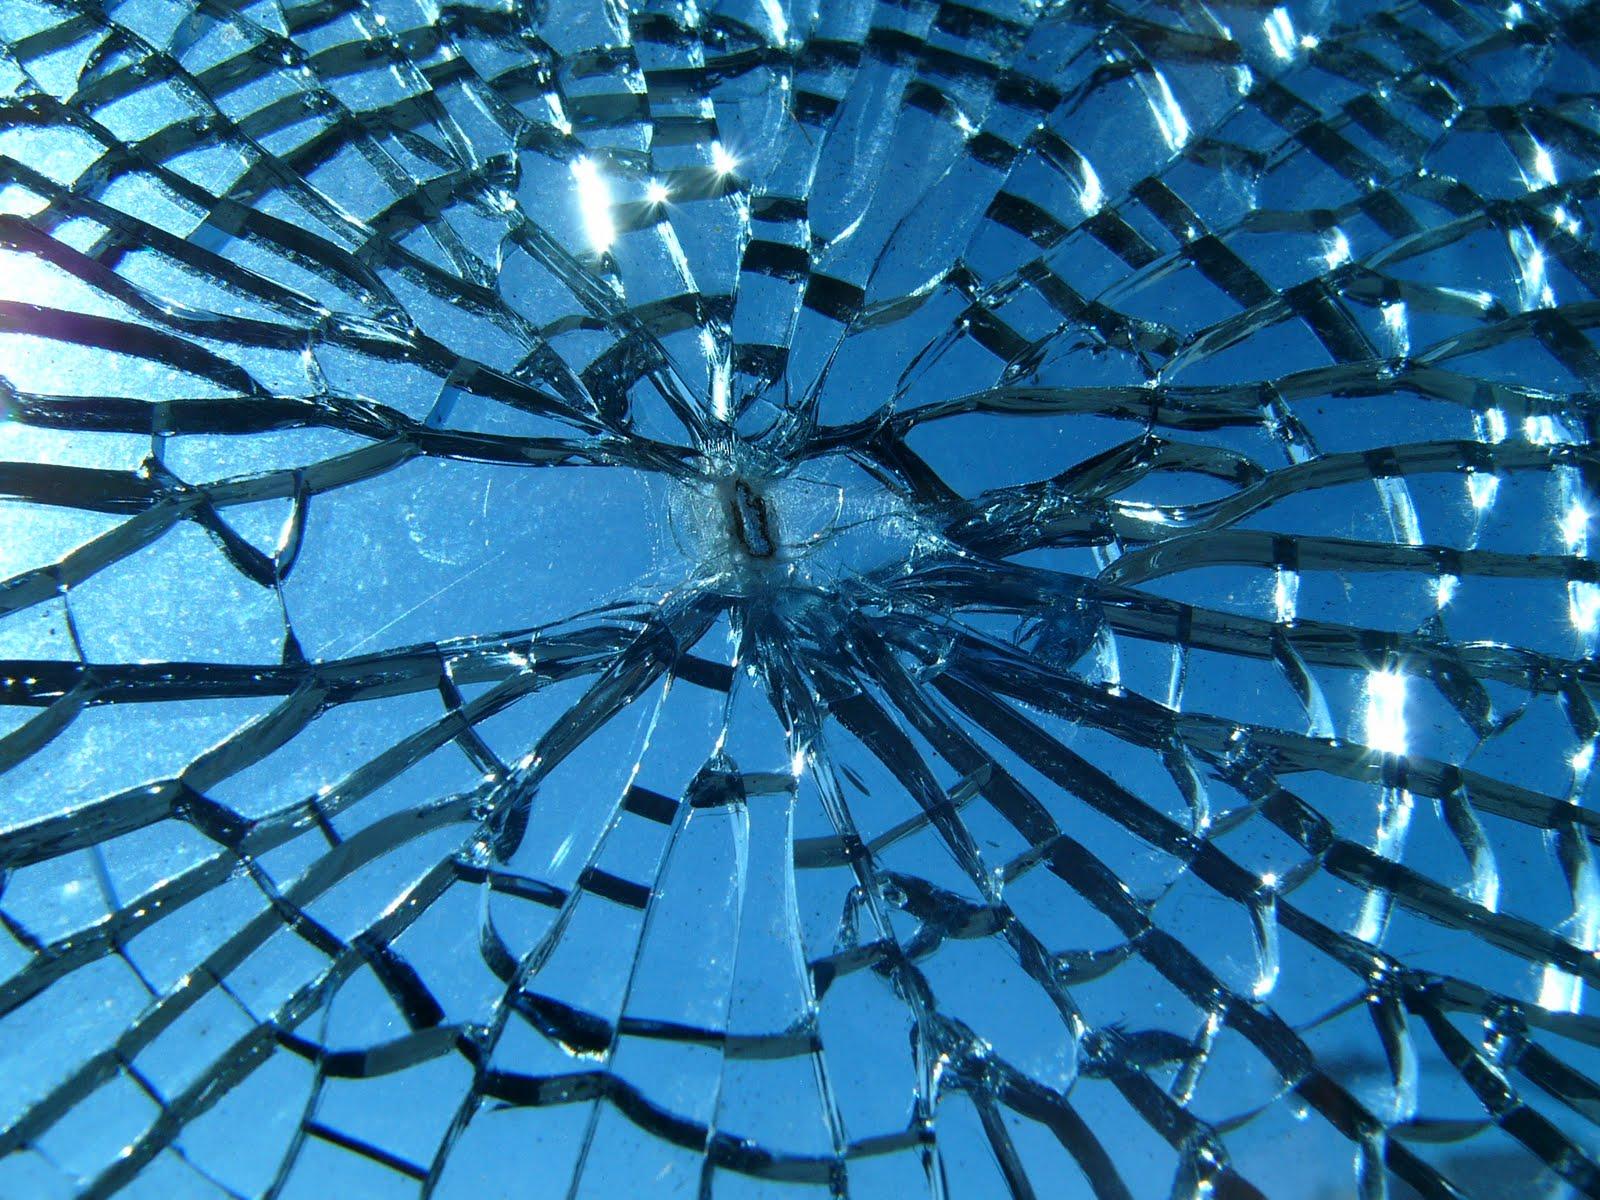 45 Realistic Cracked and Broken Screen Wallpapers   Technosamrat 1600x1200